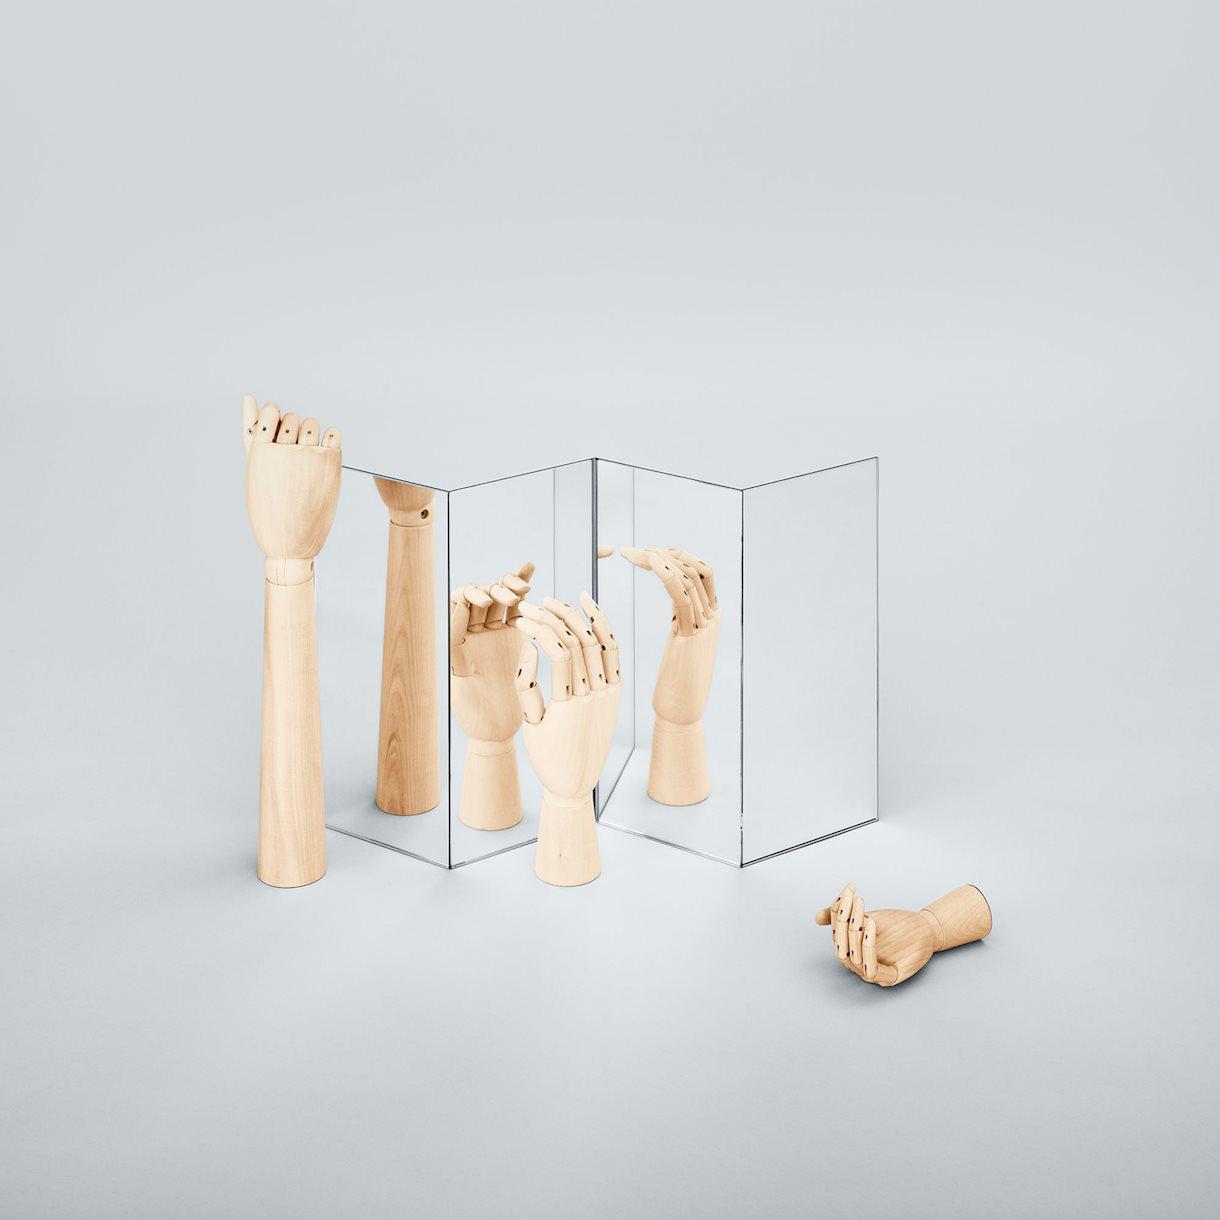 Journelles-Maison-Stylisten-Accessoires-Hay-Wooden-Hand